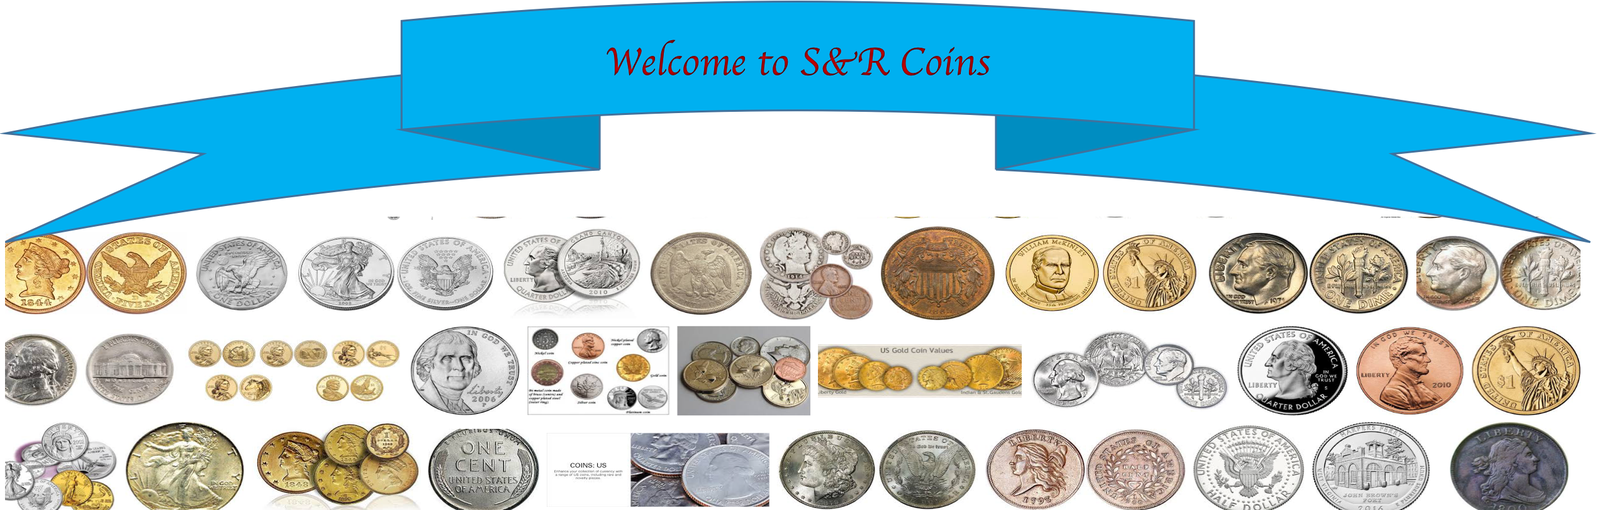 S&R Coins